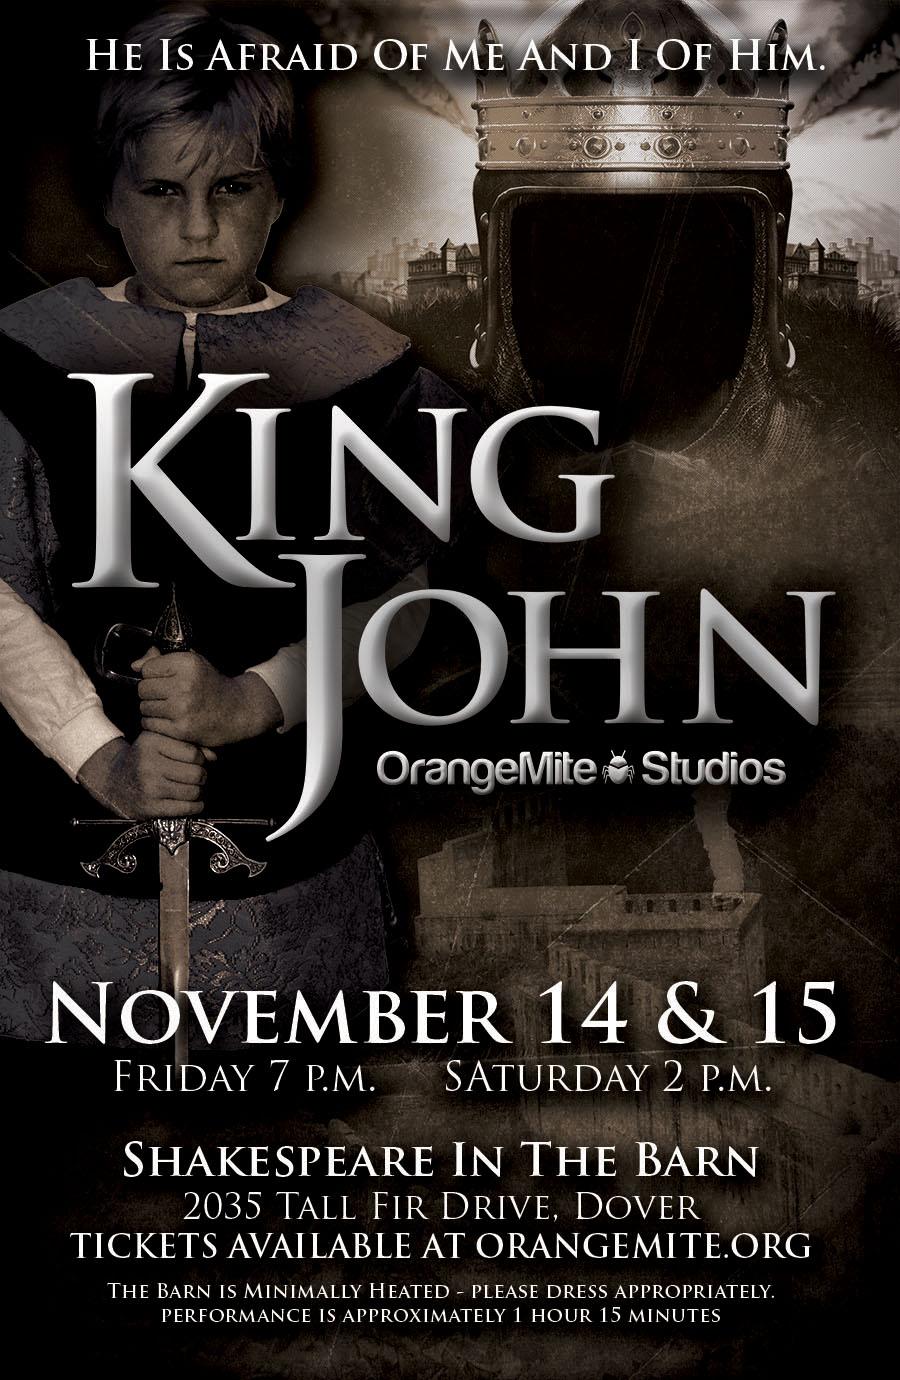 KingJohn_FINAL_WEB.jpg